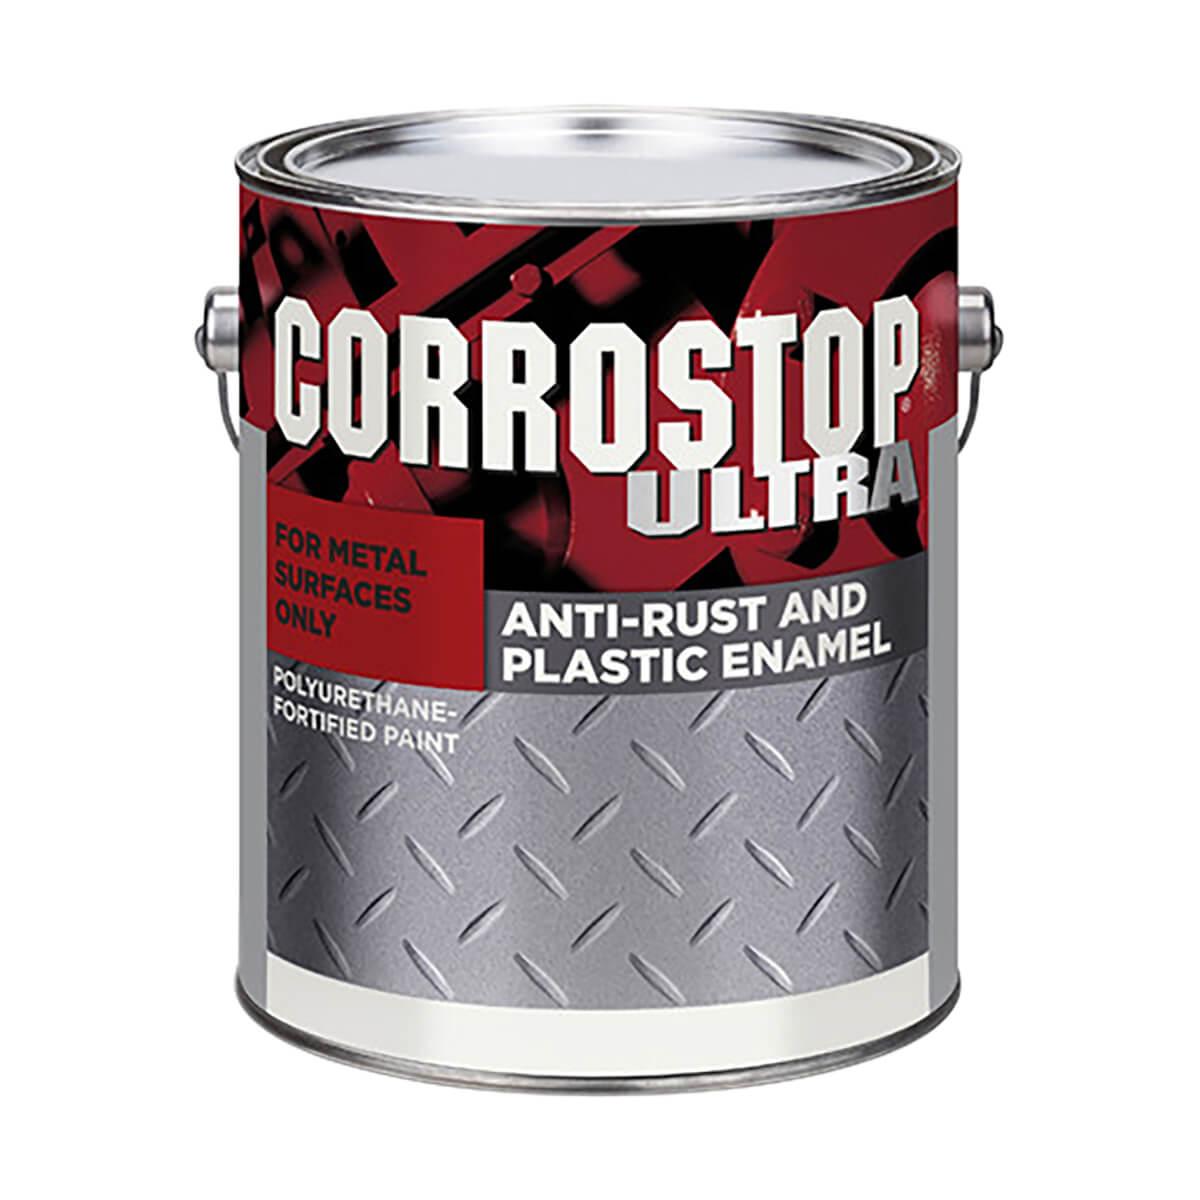 Corrostop - Anti-rust Alkyd Paint - John Deere Green - 3.78 L